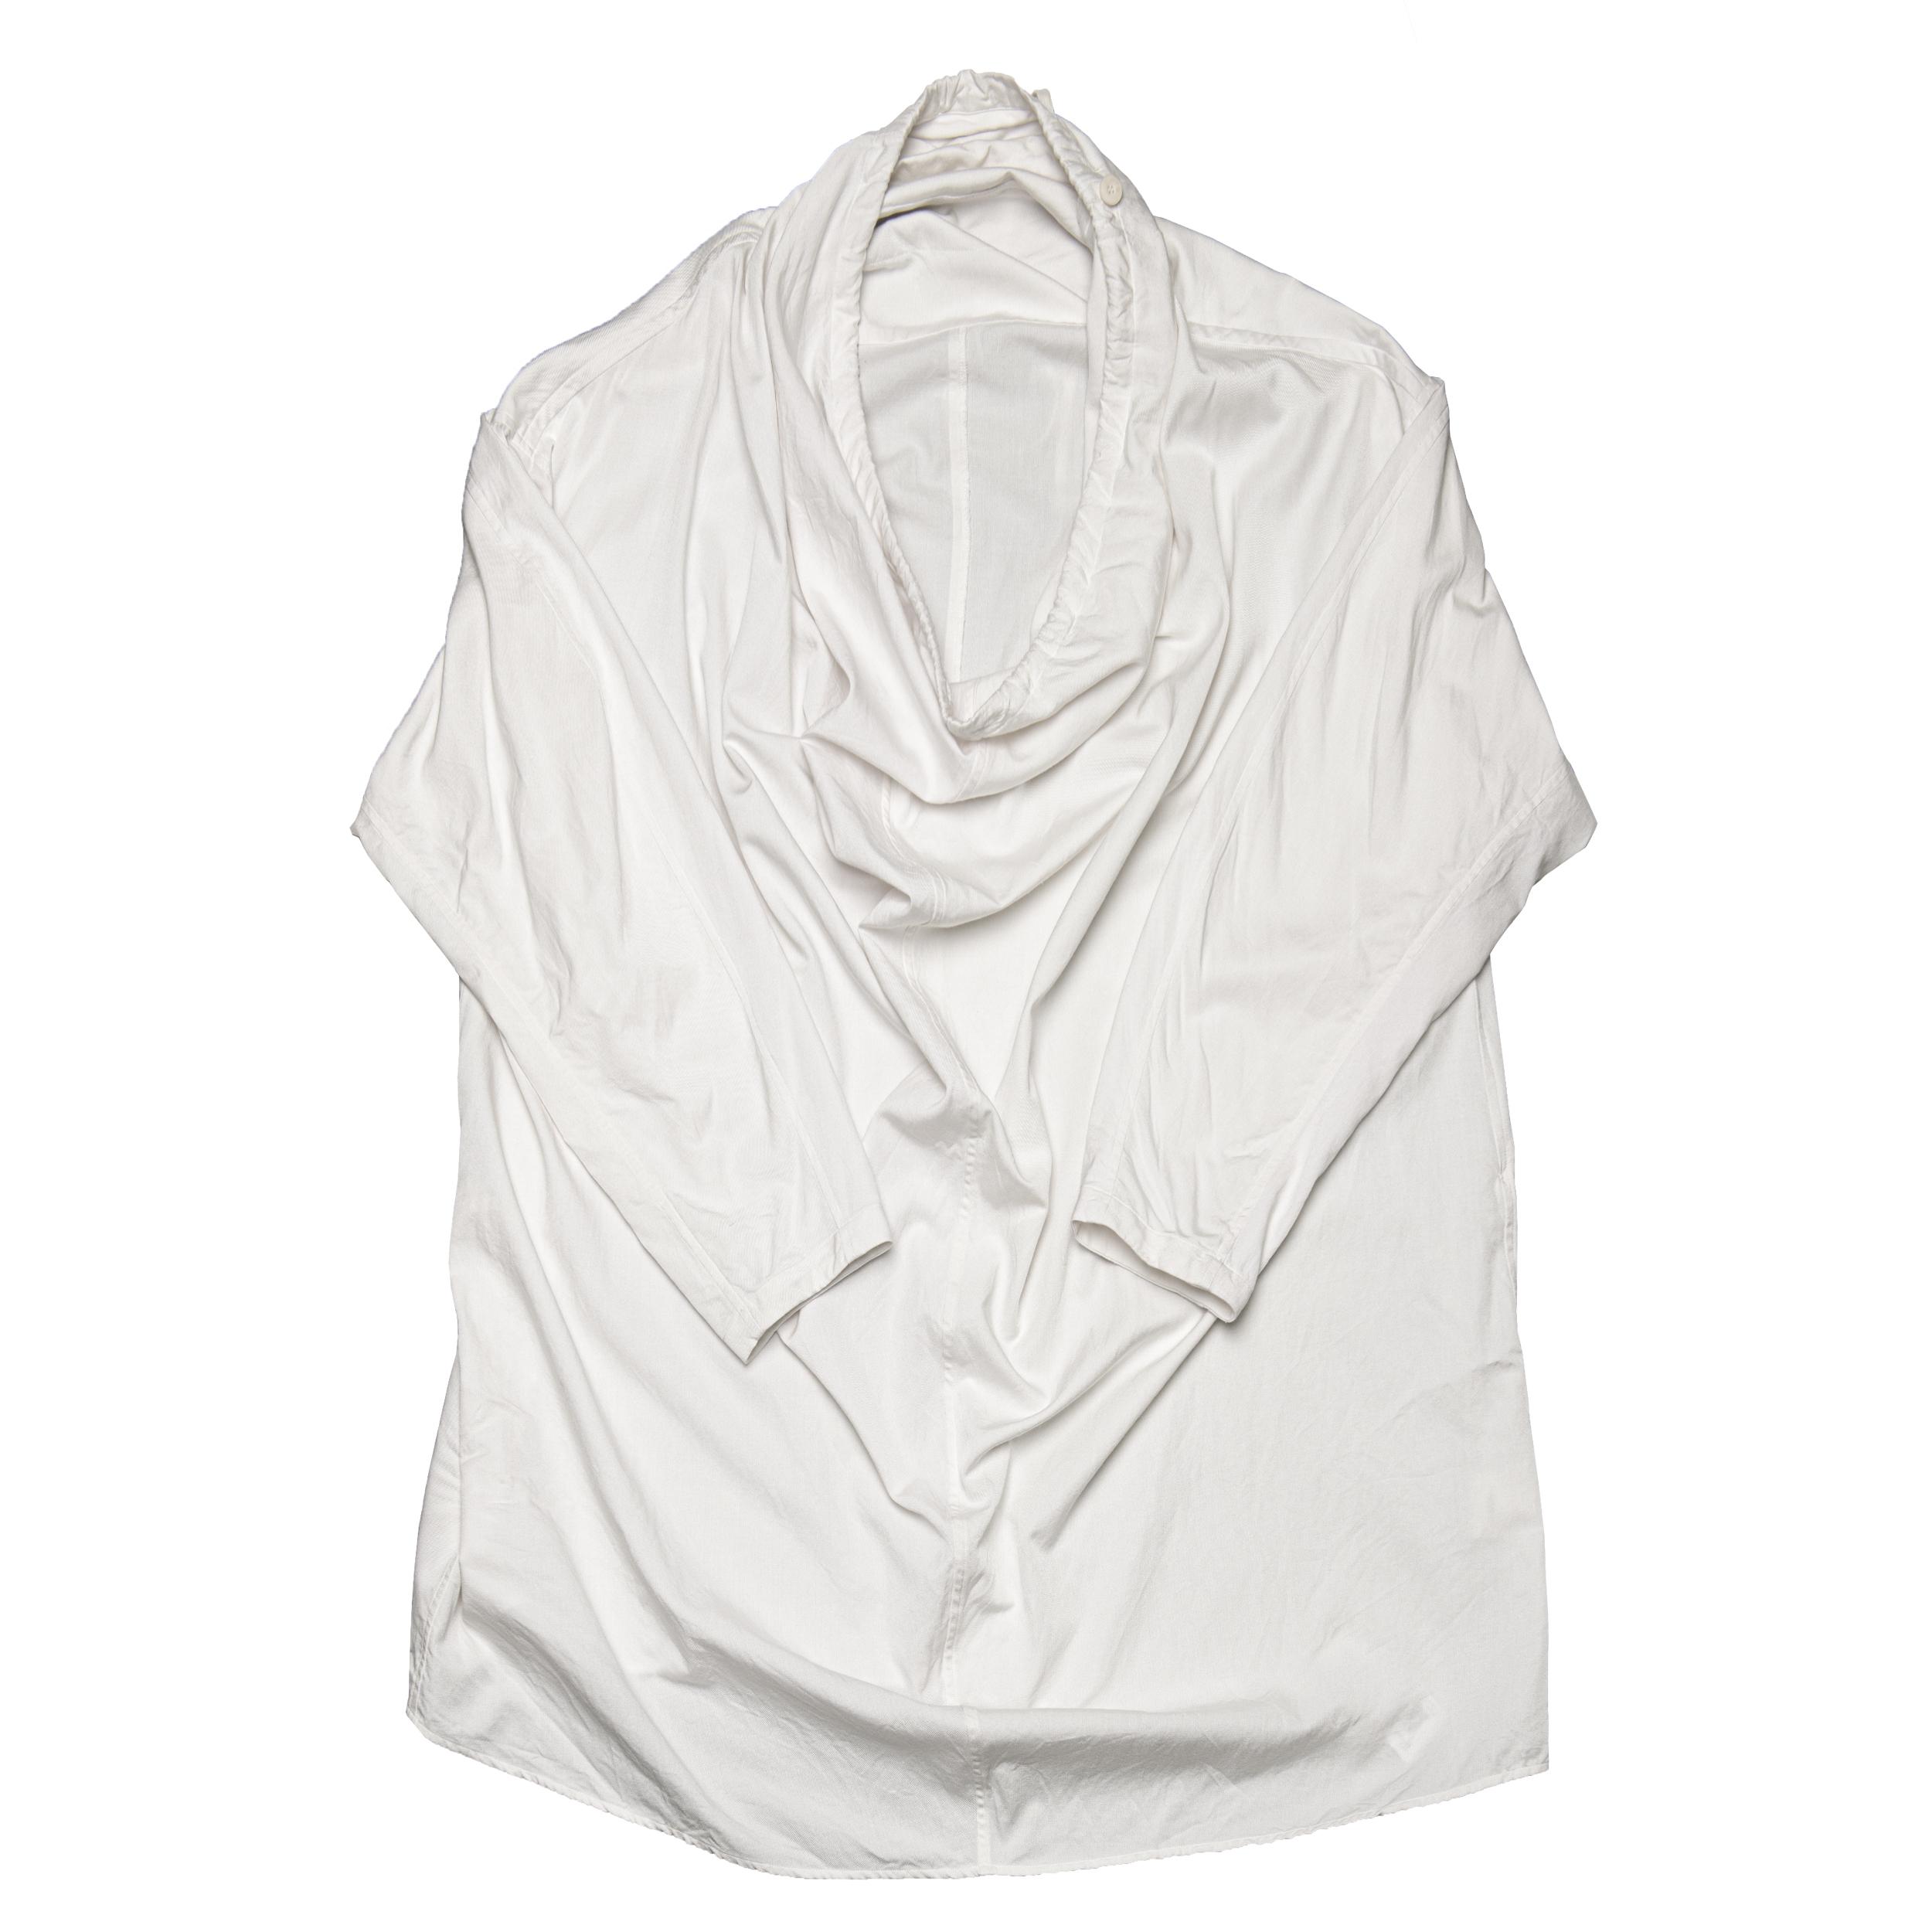 687SHM3-OFF / ドレープネックシャツ